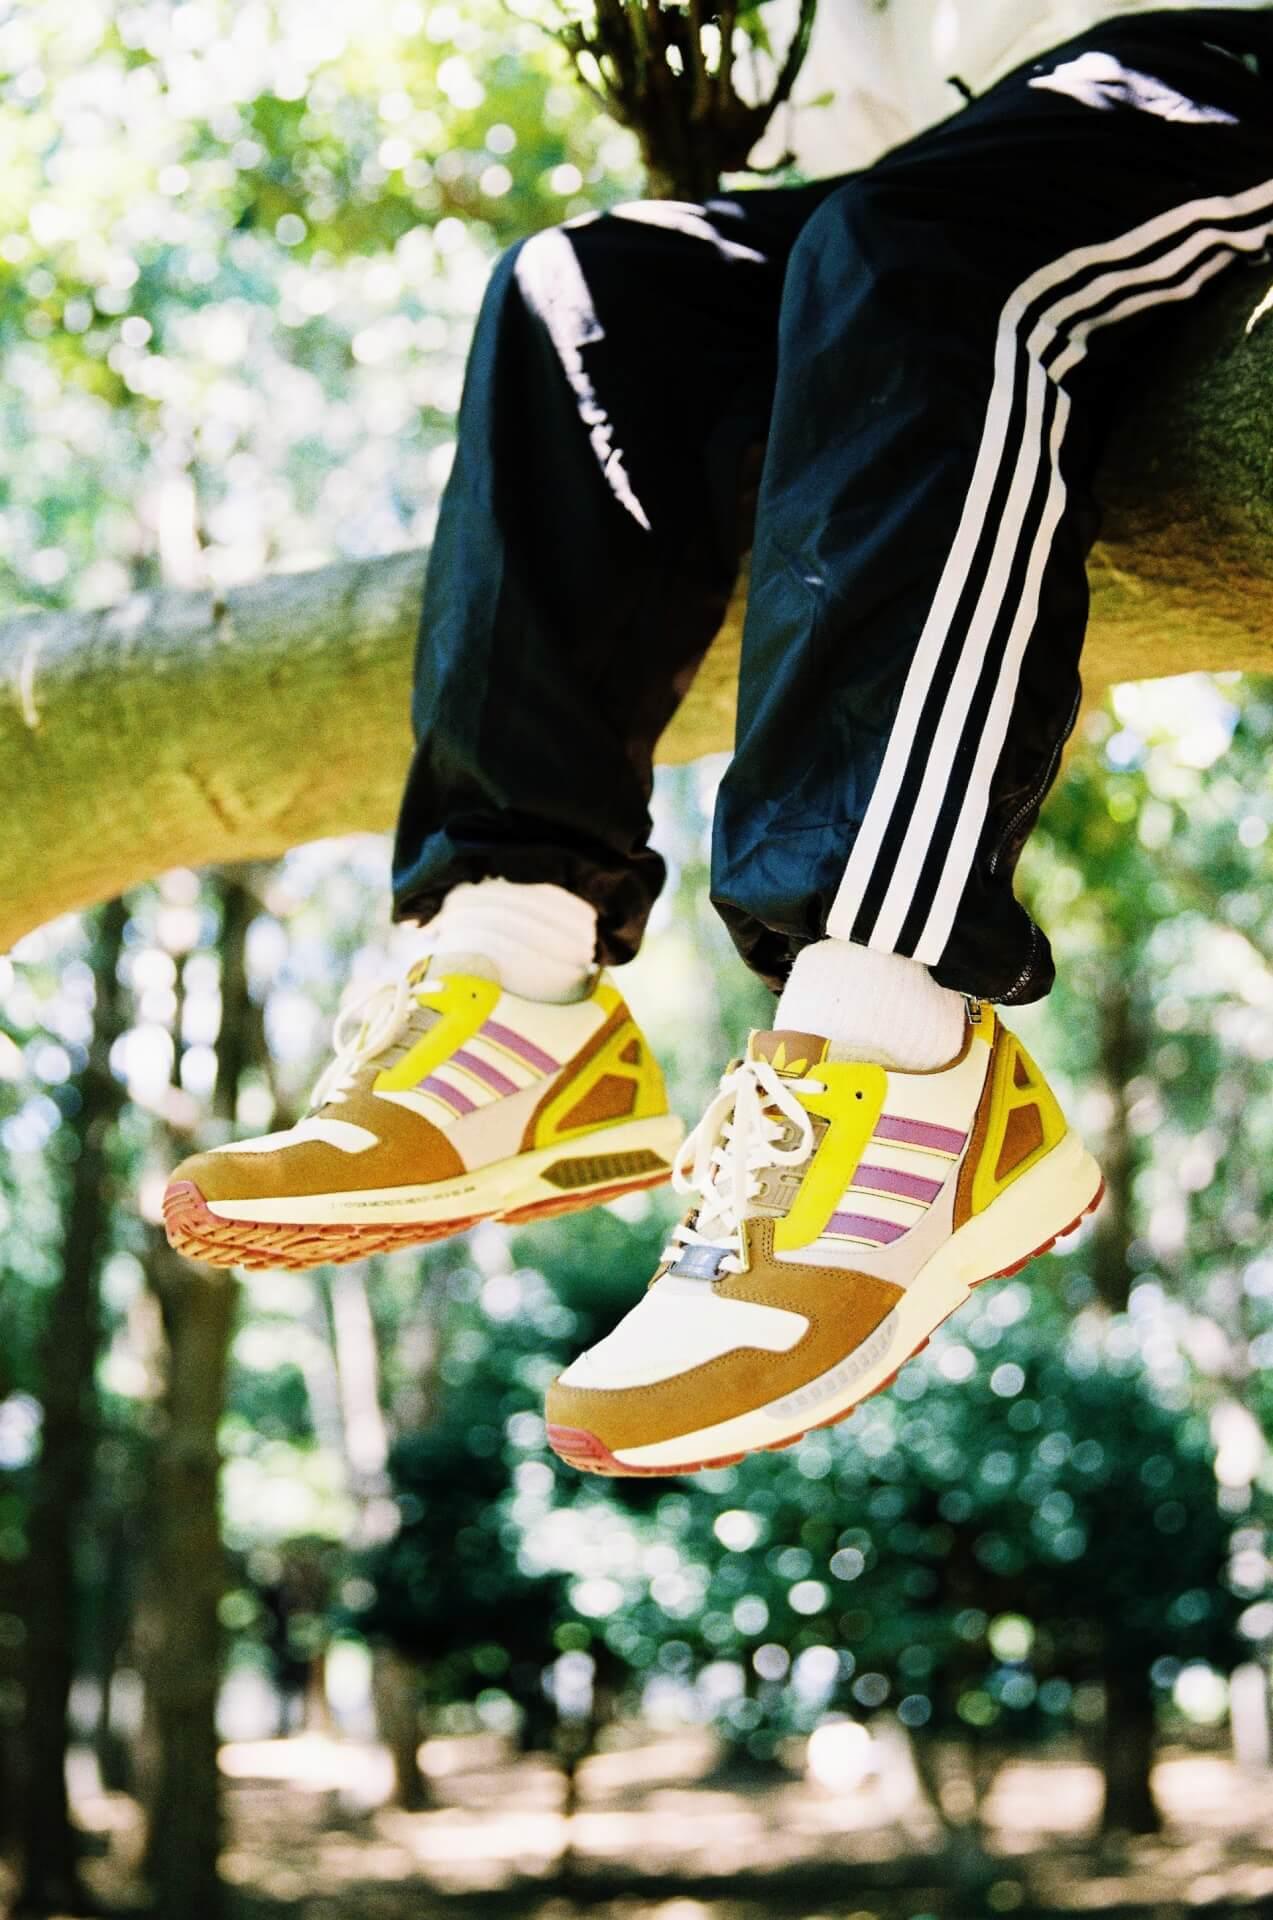 "adidas Originalsとatmosのコラボパック「""YOYOGI PARK"" PACK」が登場!代々木公園をモチーフにしたZX 8000、FORUMの2足が発売 life210802_adidasoriginals_yoyogipark_8"